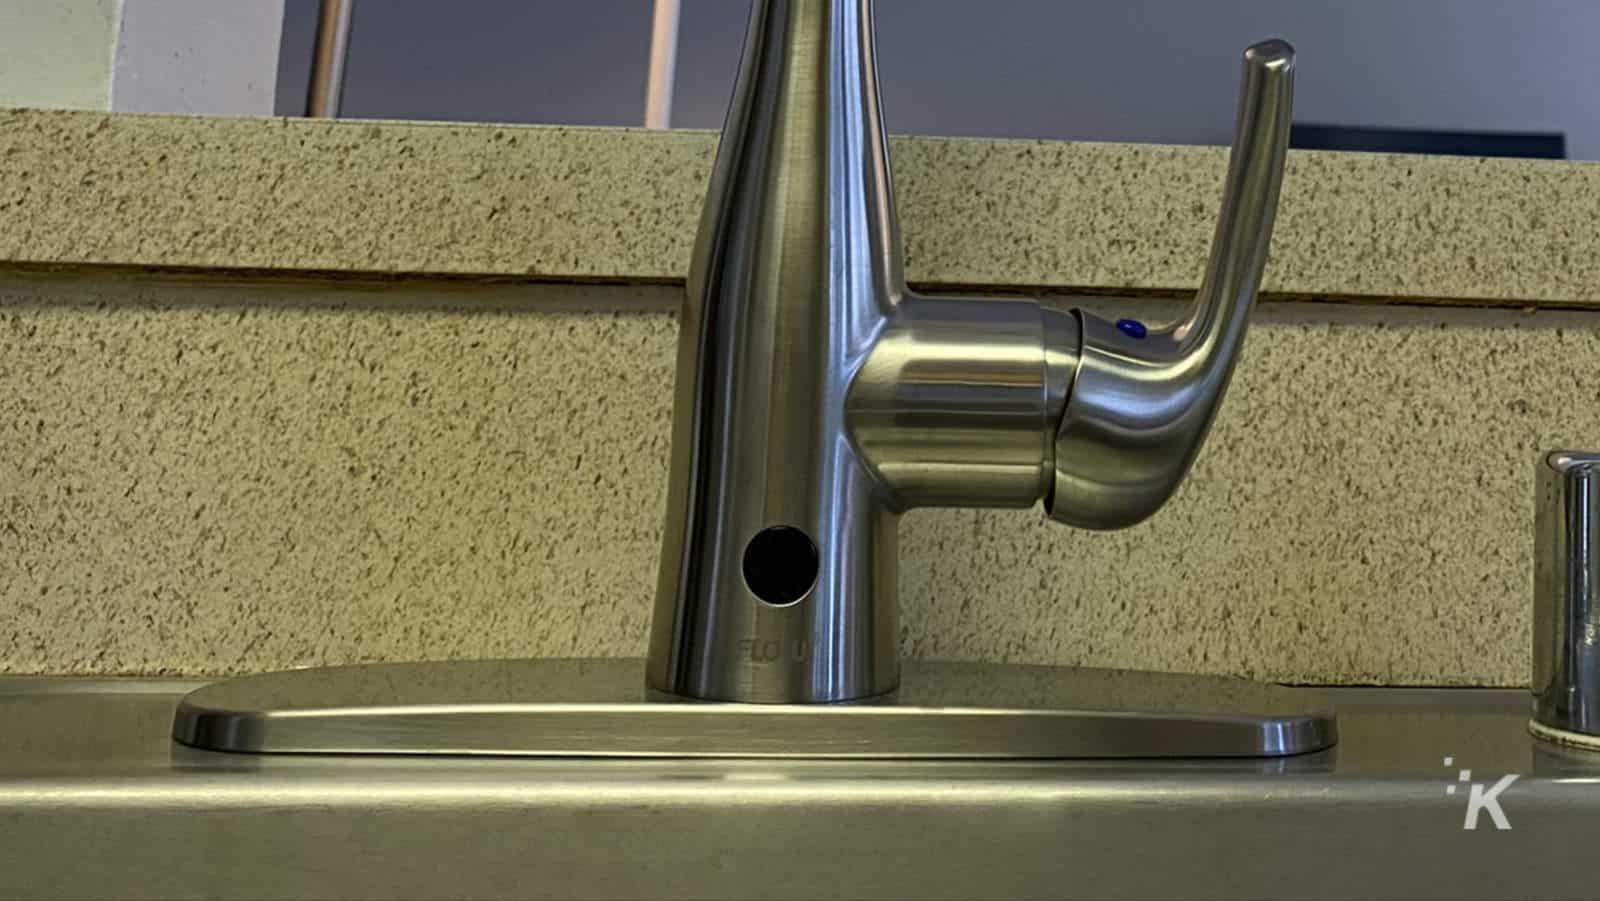 biobidet flow faucet sensor